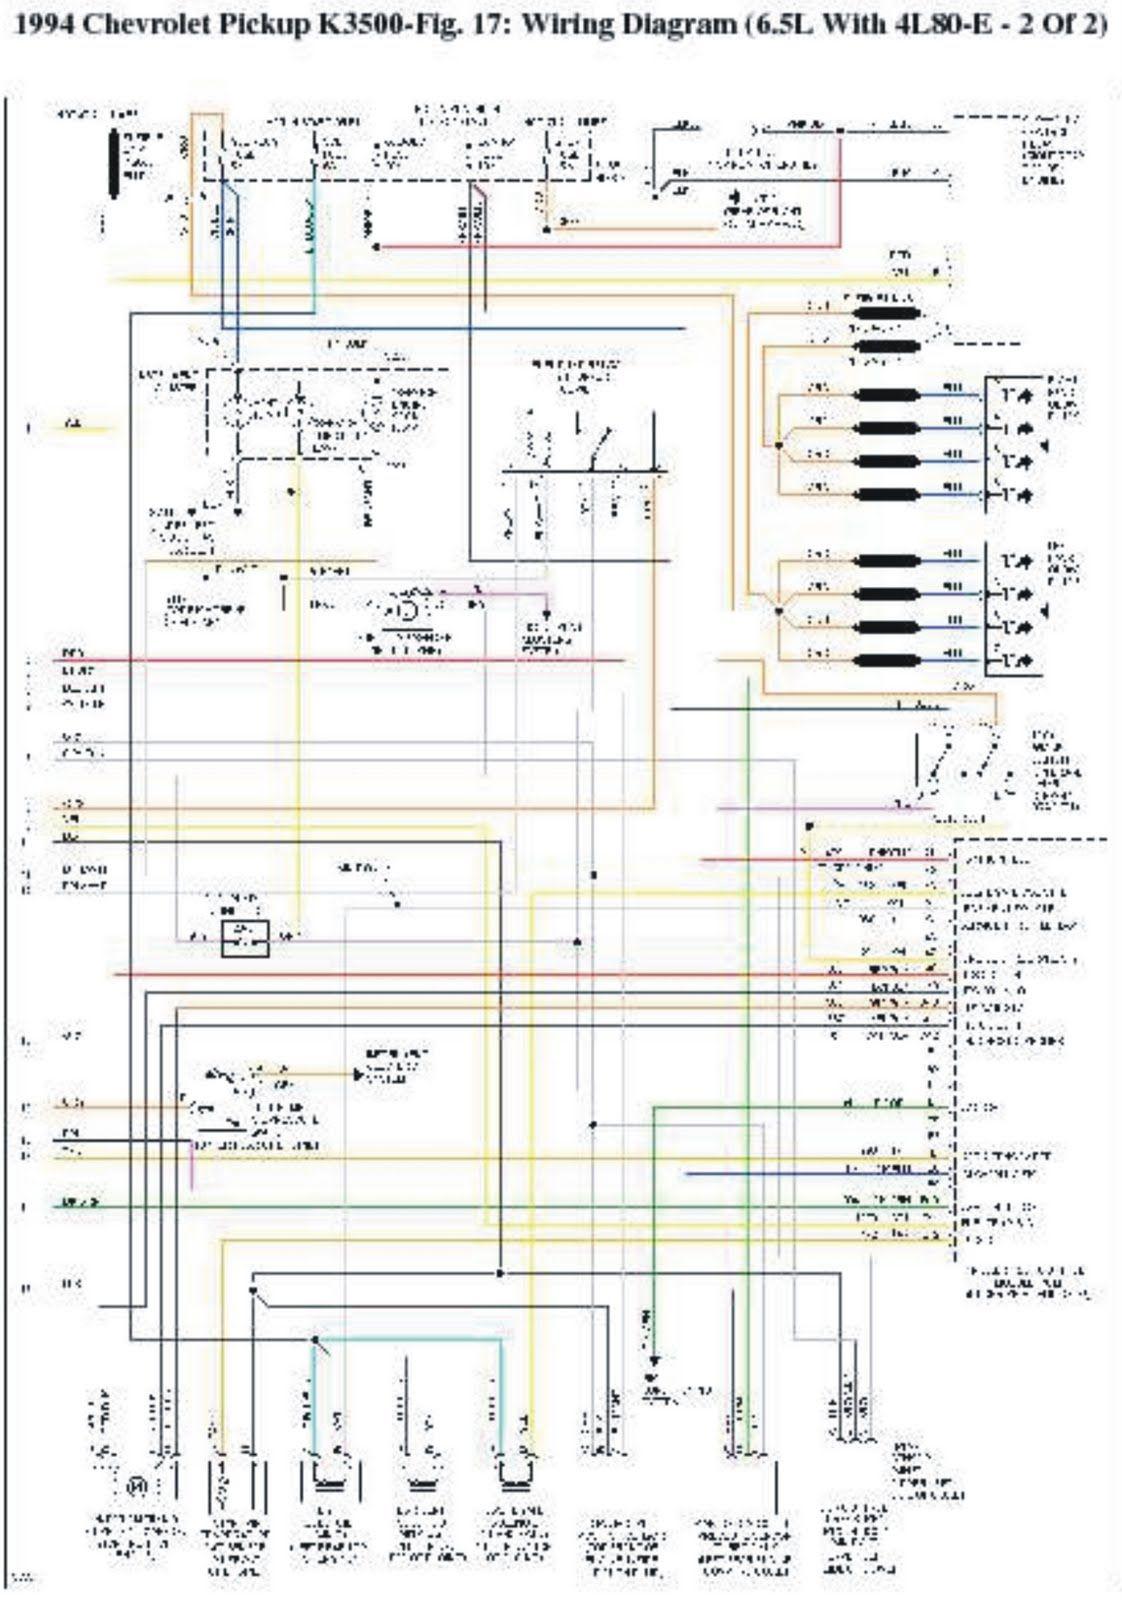 1994 Chevy Silverado Wiring Diagram 5a233c4206301 With Chevy Silverado Chevy 1500 1994 Chevy Silverado